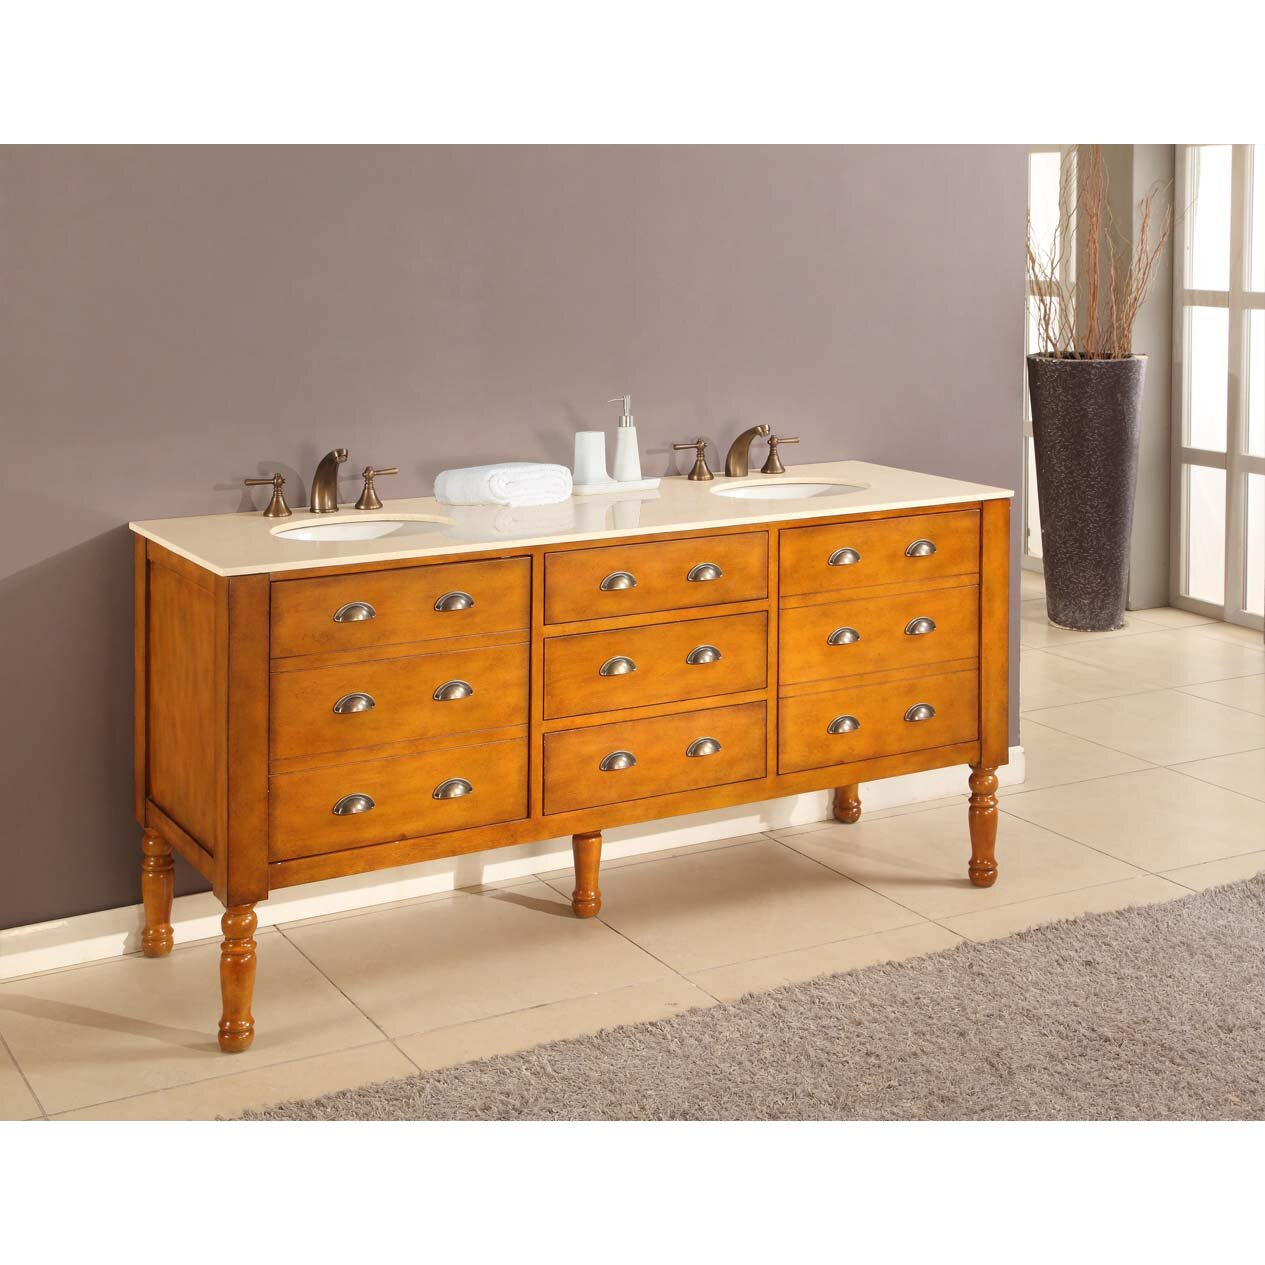 Direct Vanity Sink Harvest 70 Double Bathroom Vanity Set